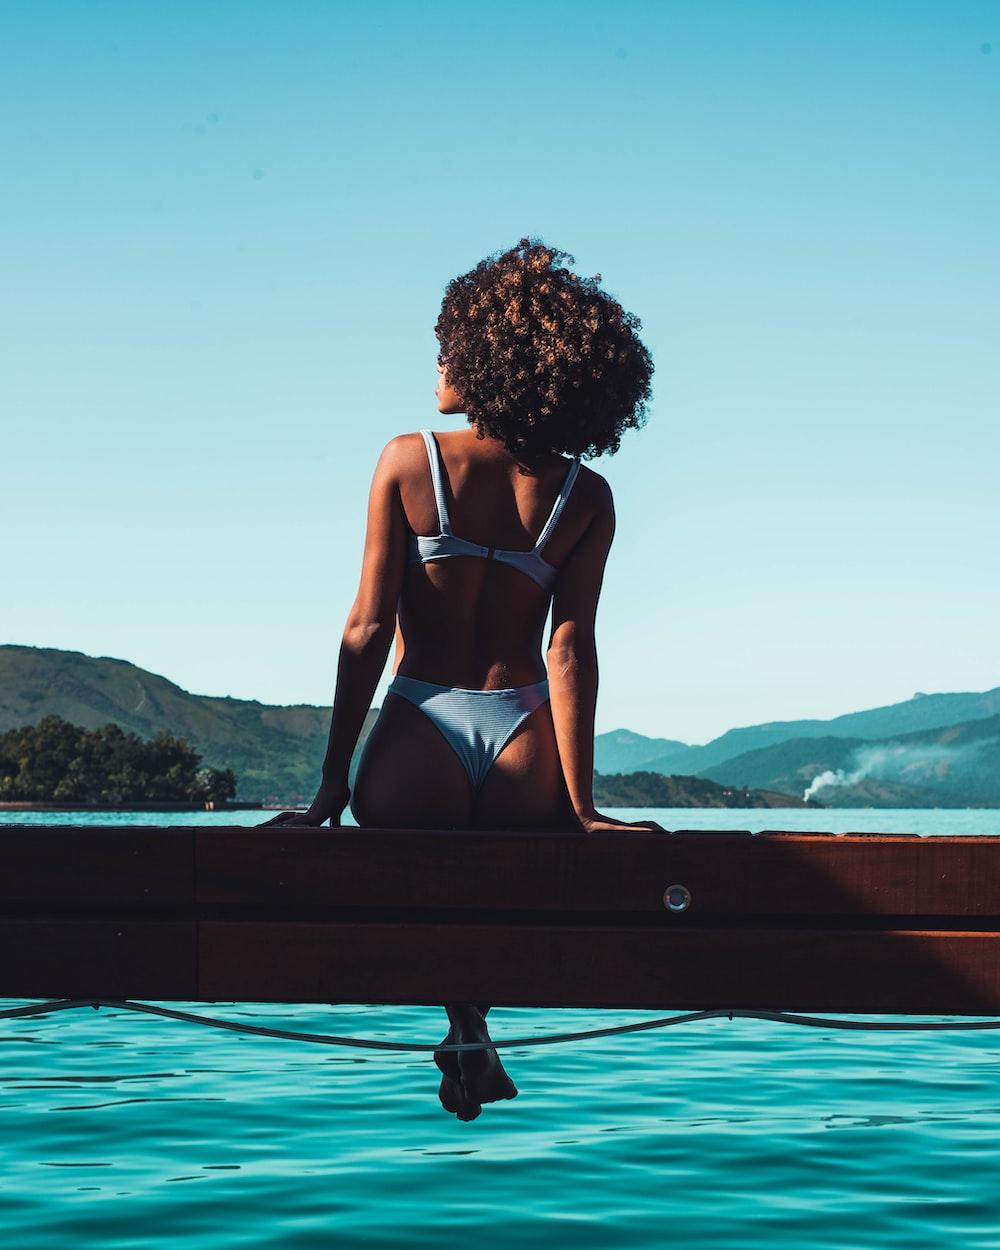 woman in black bikini sitting on black wooden bench during daytime